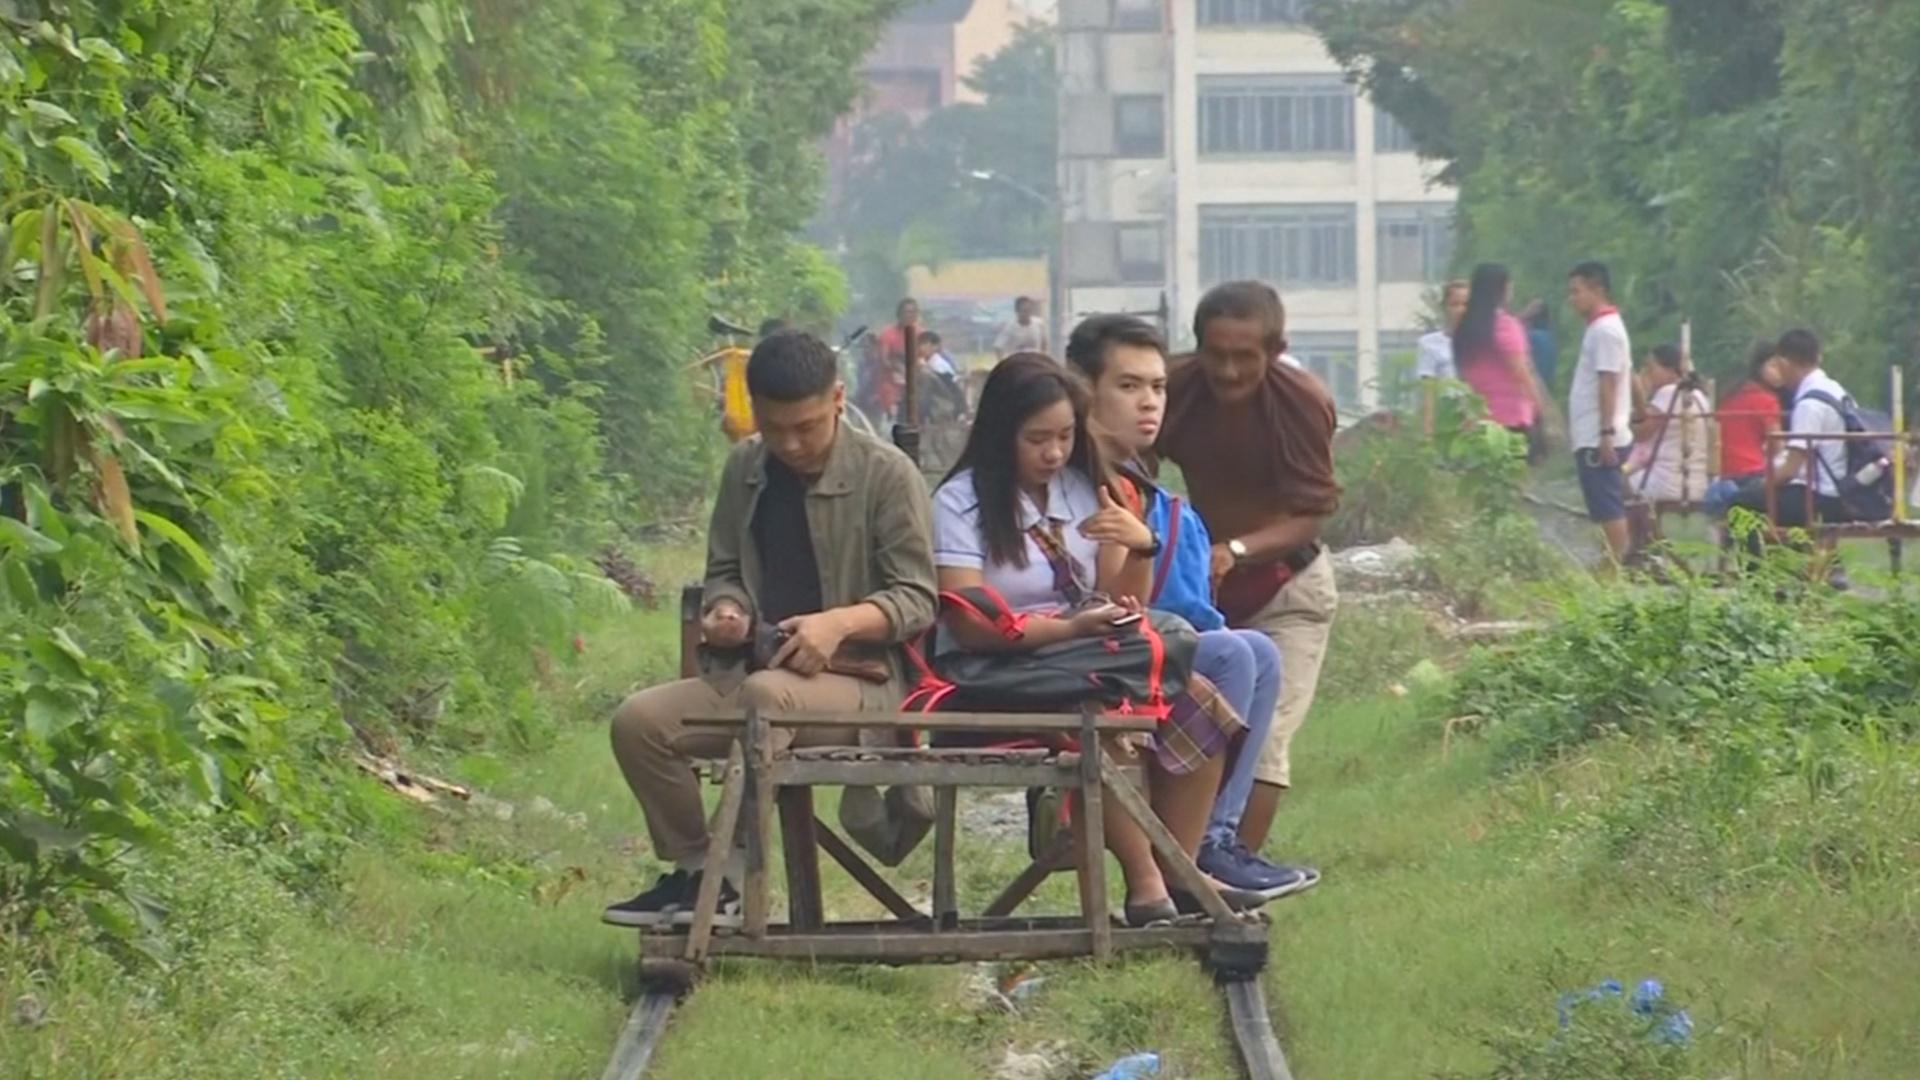 Филиппинцев возят по рельсам «мальчики-вагонетки»